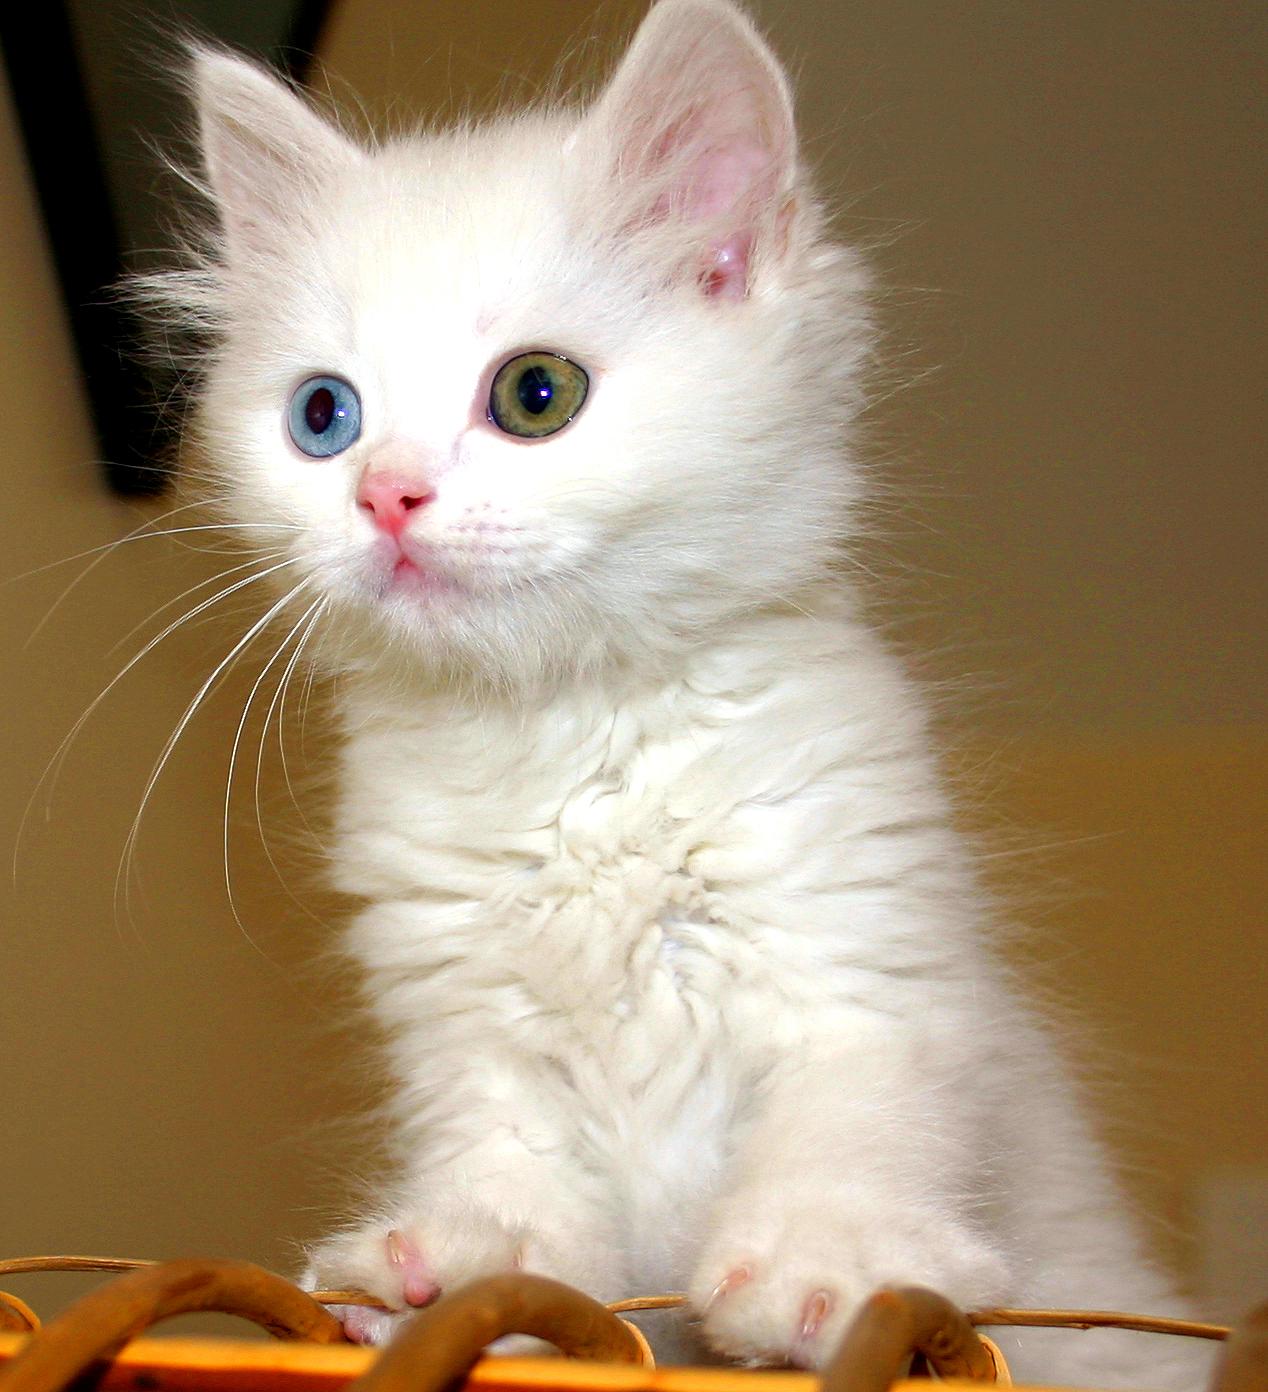 620baa425c Van cat - Wikipedia